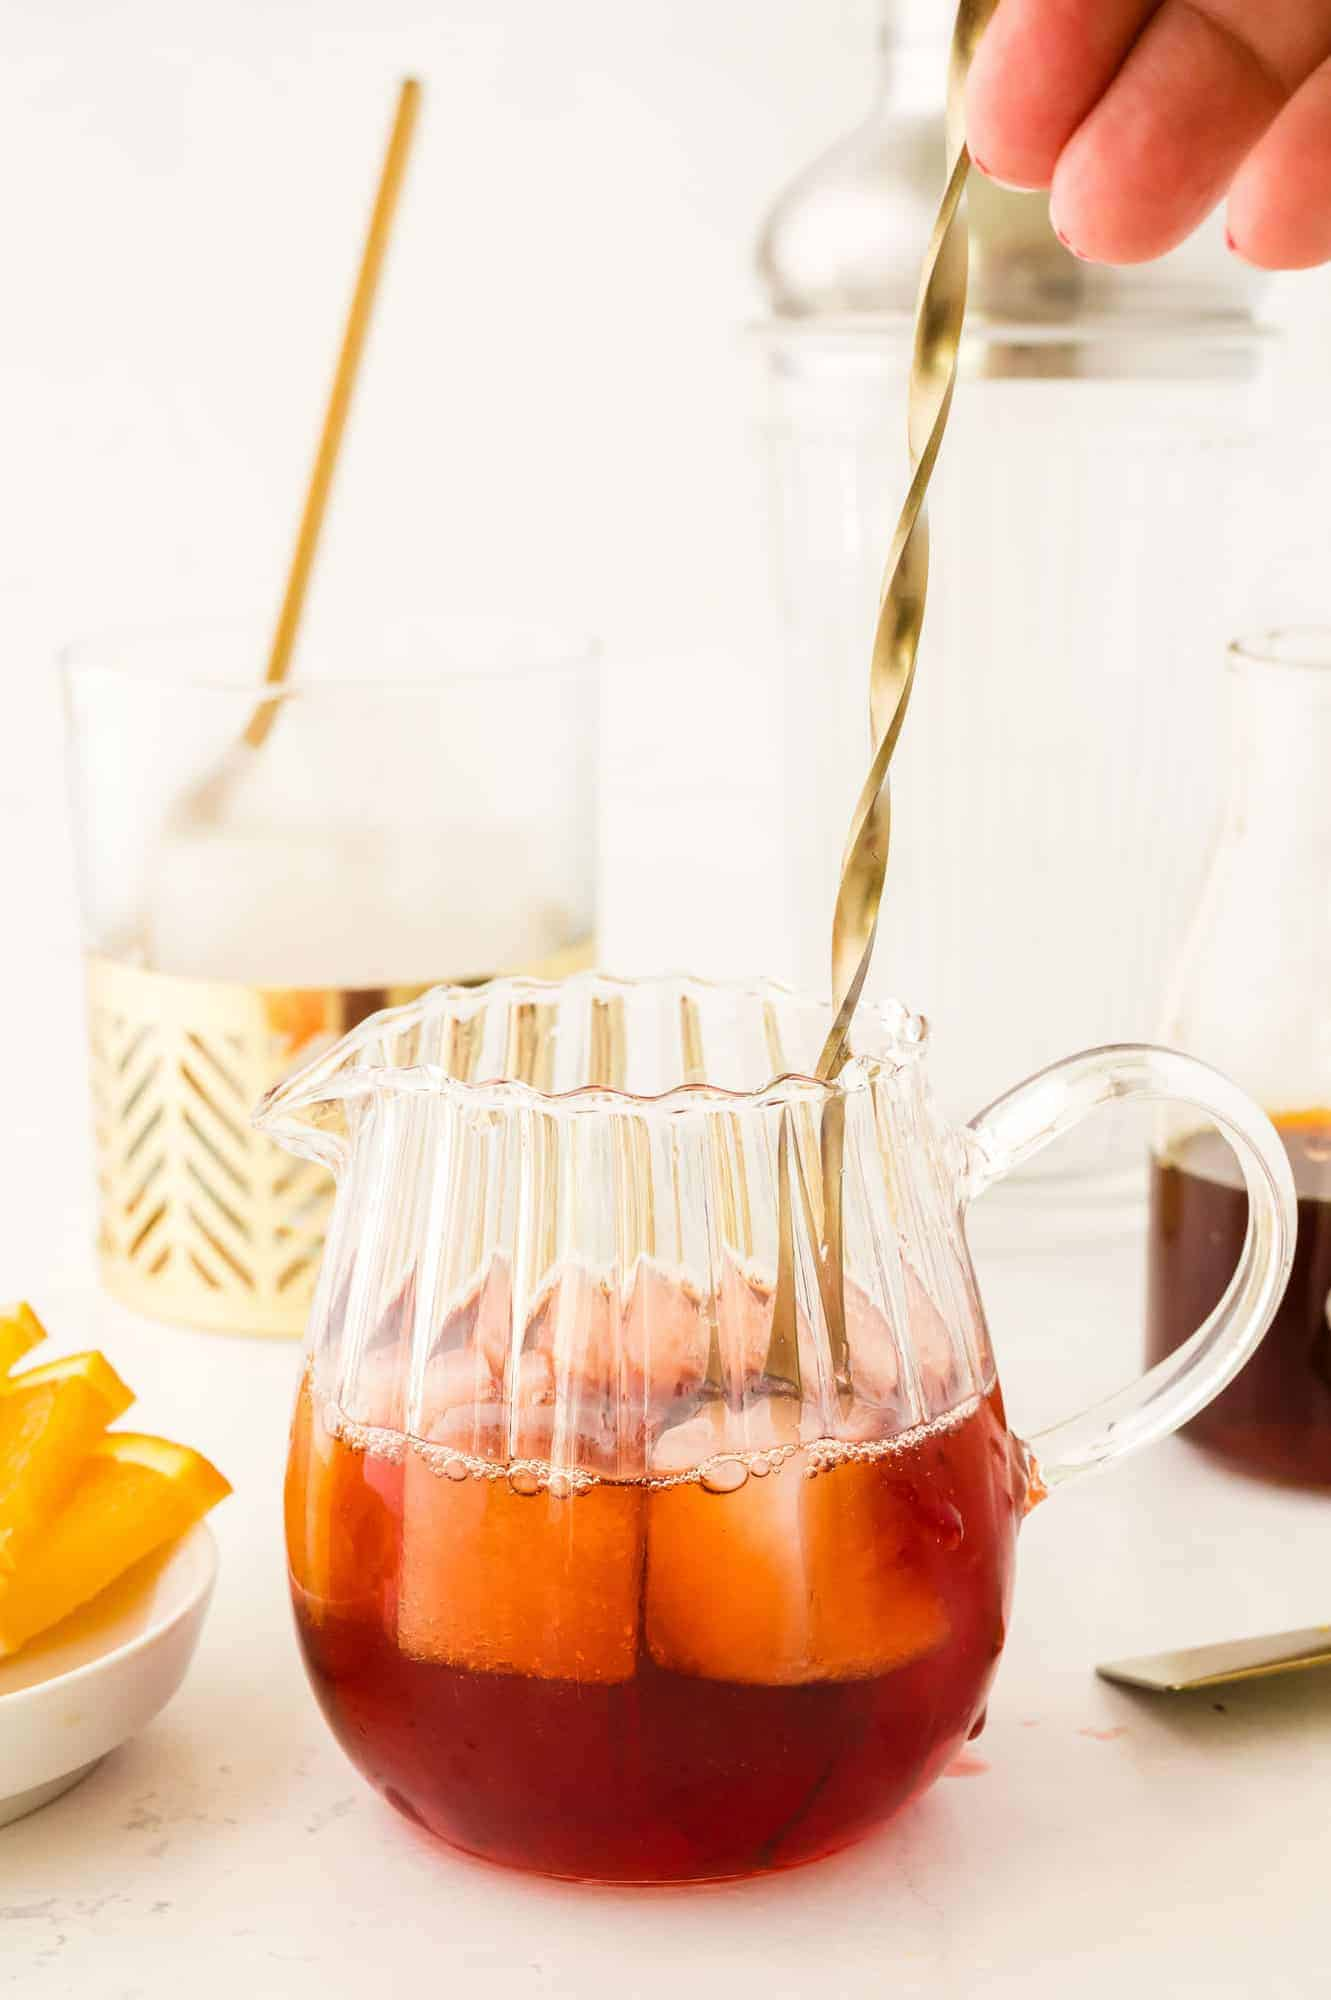 Drink being stirred.